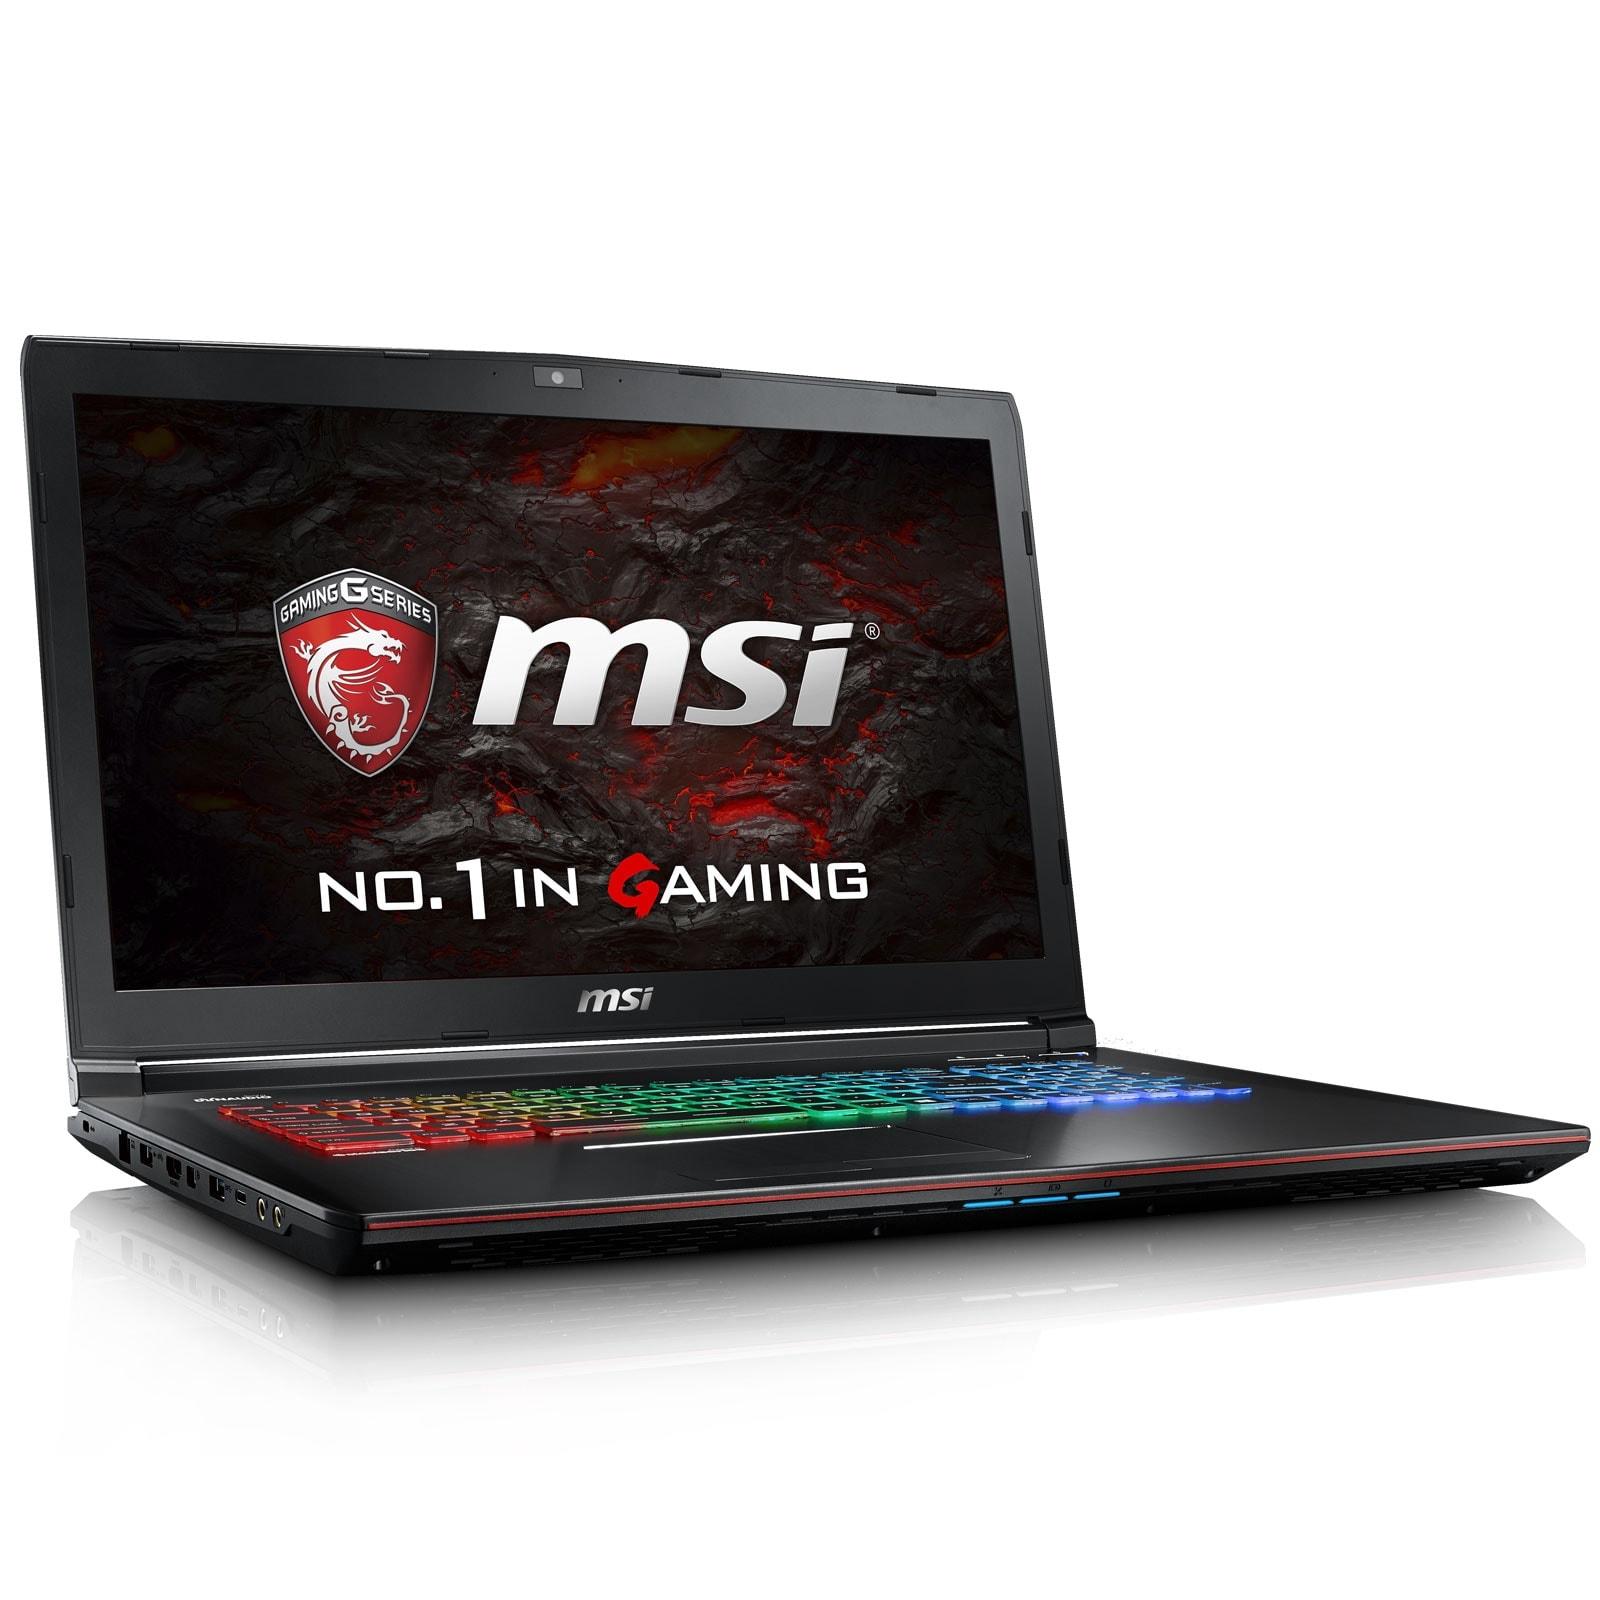 MSI GE72VR 6RF(Apache Pro)-018FR (9S7-179B11-018) - Achat / Vente PC portable sur Cybertek.fr - 0